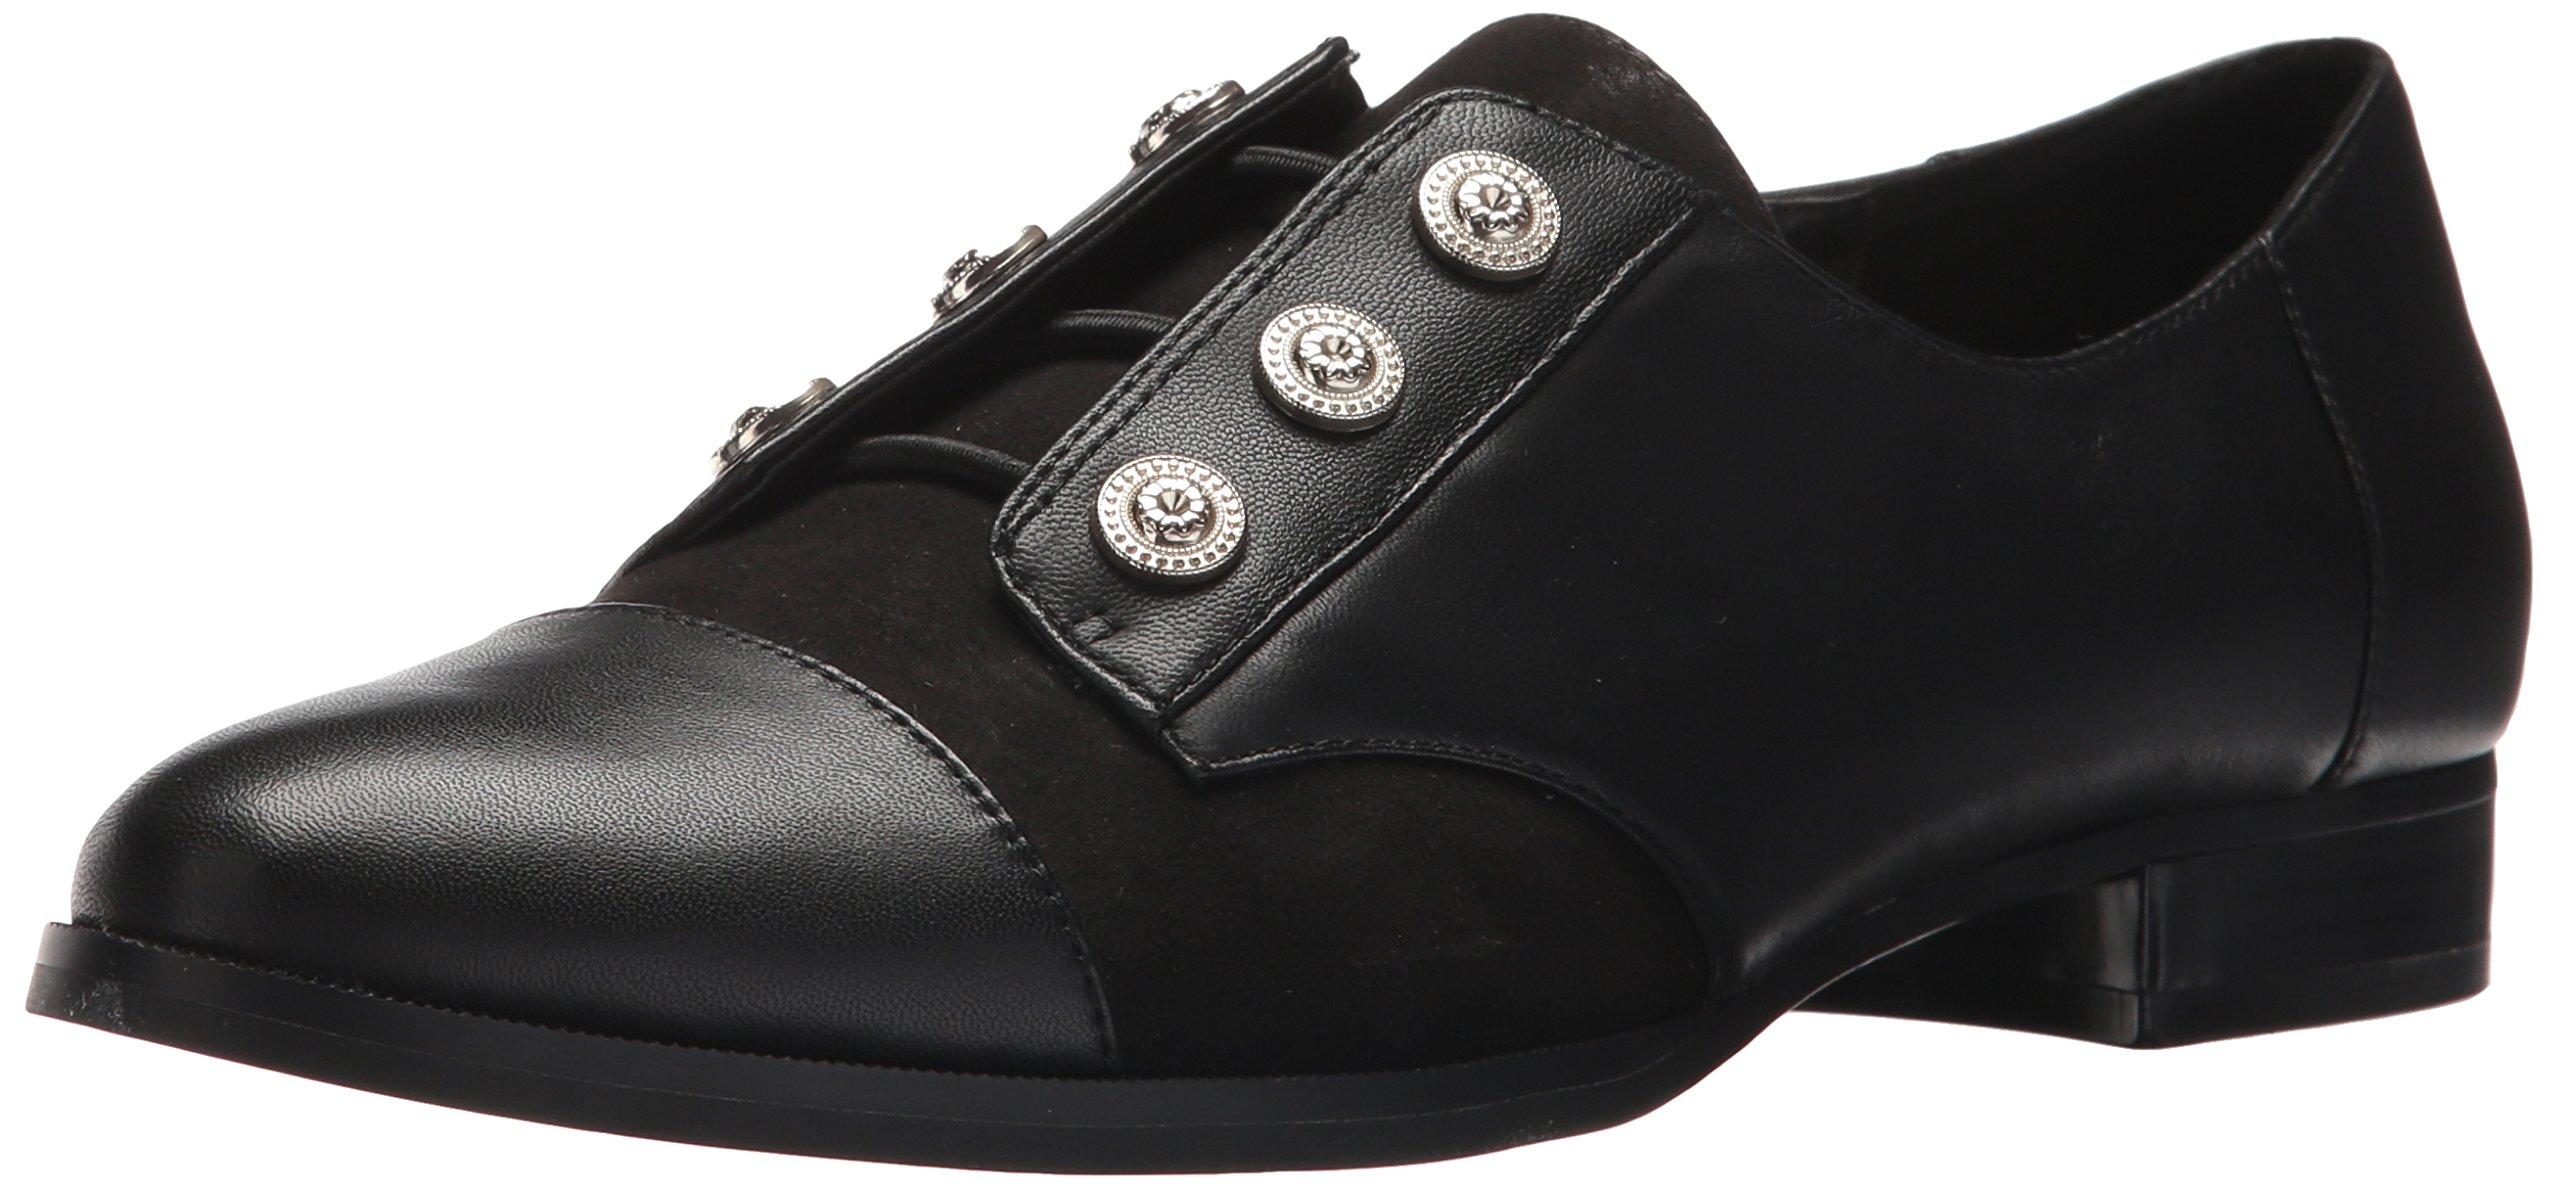 Nine West Women's Here Leather Uniform Dress Shoe, Black/Multi Leather, 7.5 M US